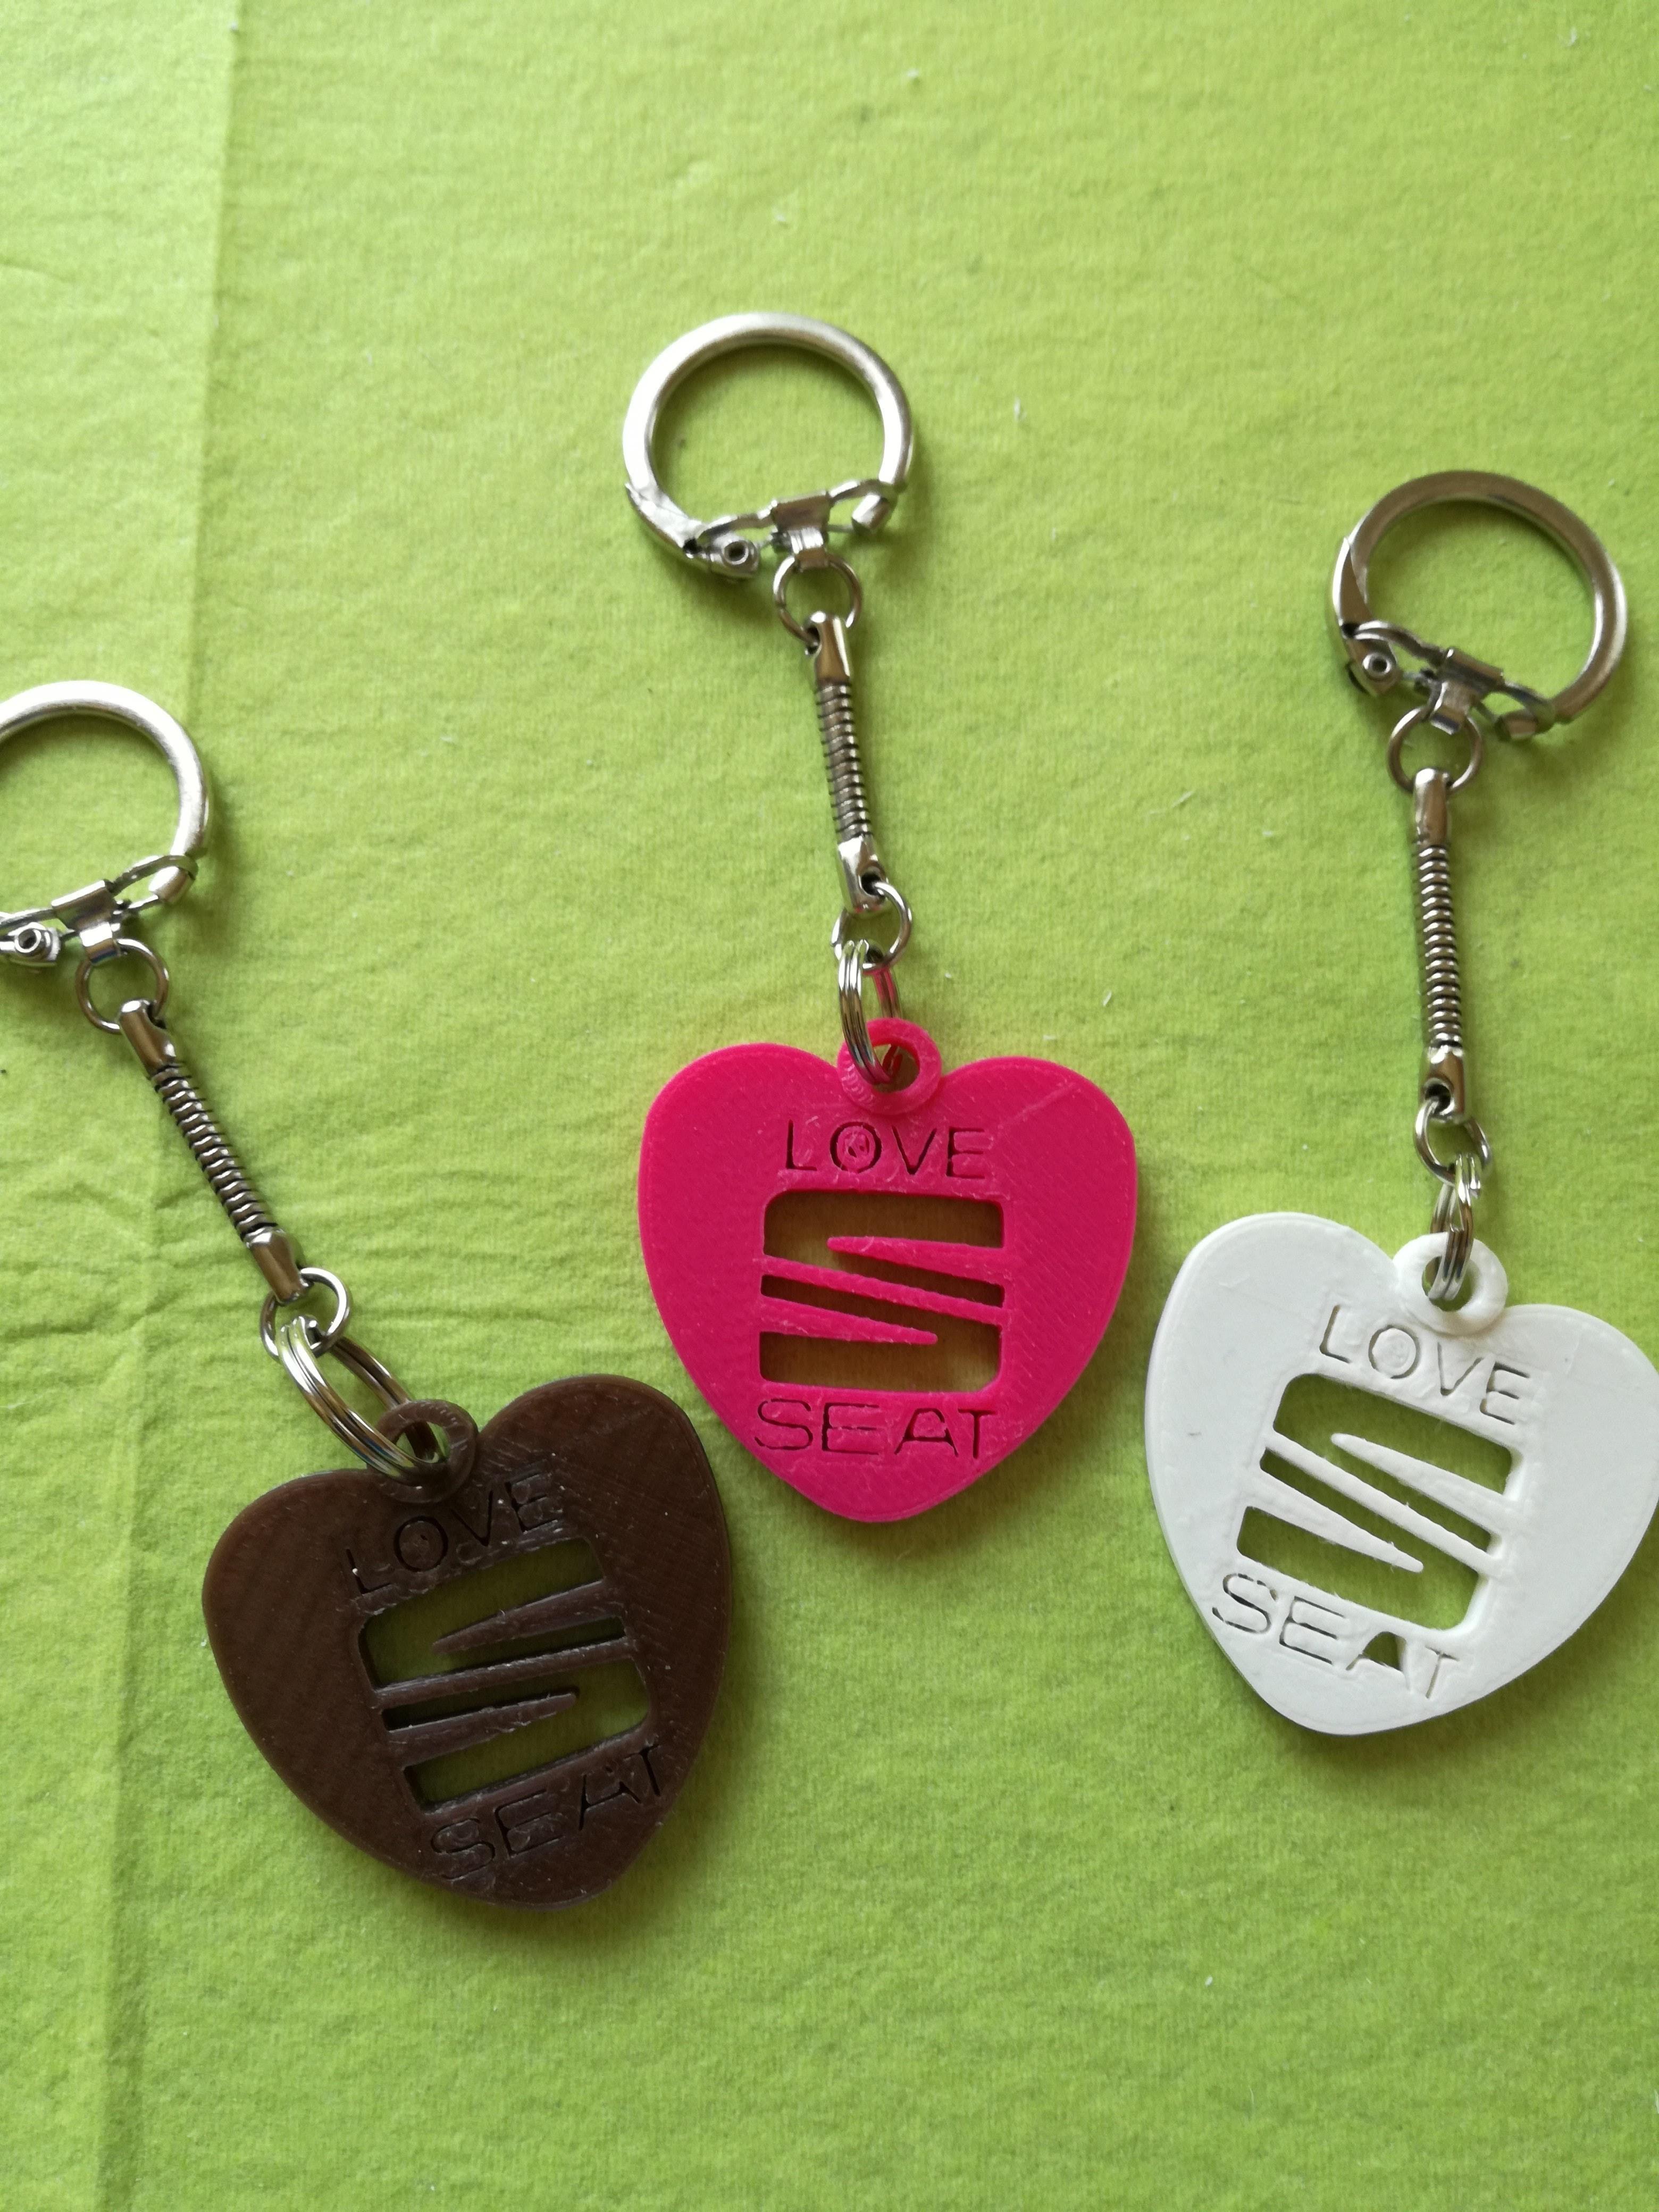 Love-SEAT.jpg Download free STL file SEAT key ring • 3D printer design, Pegazepi